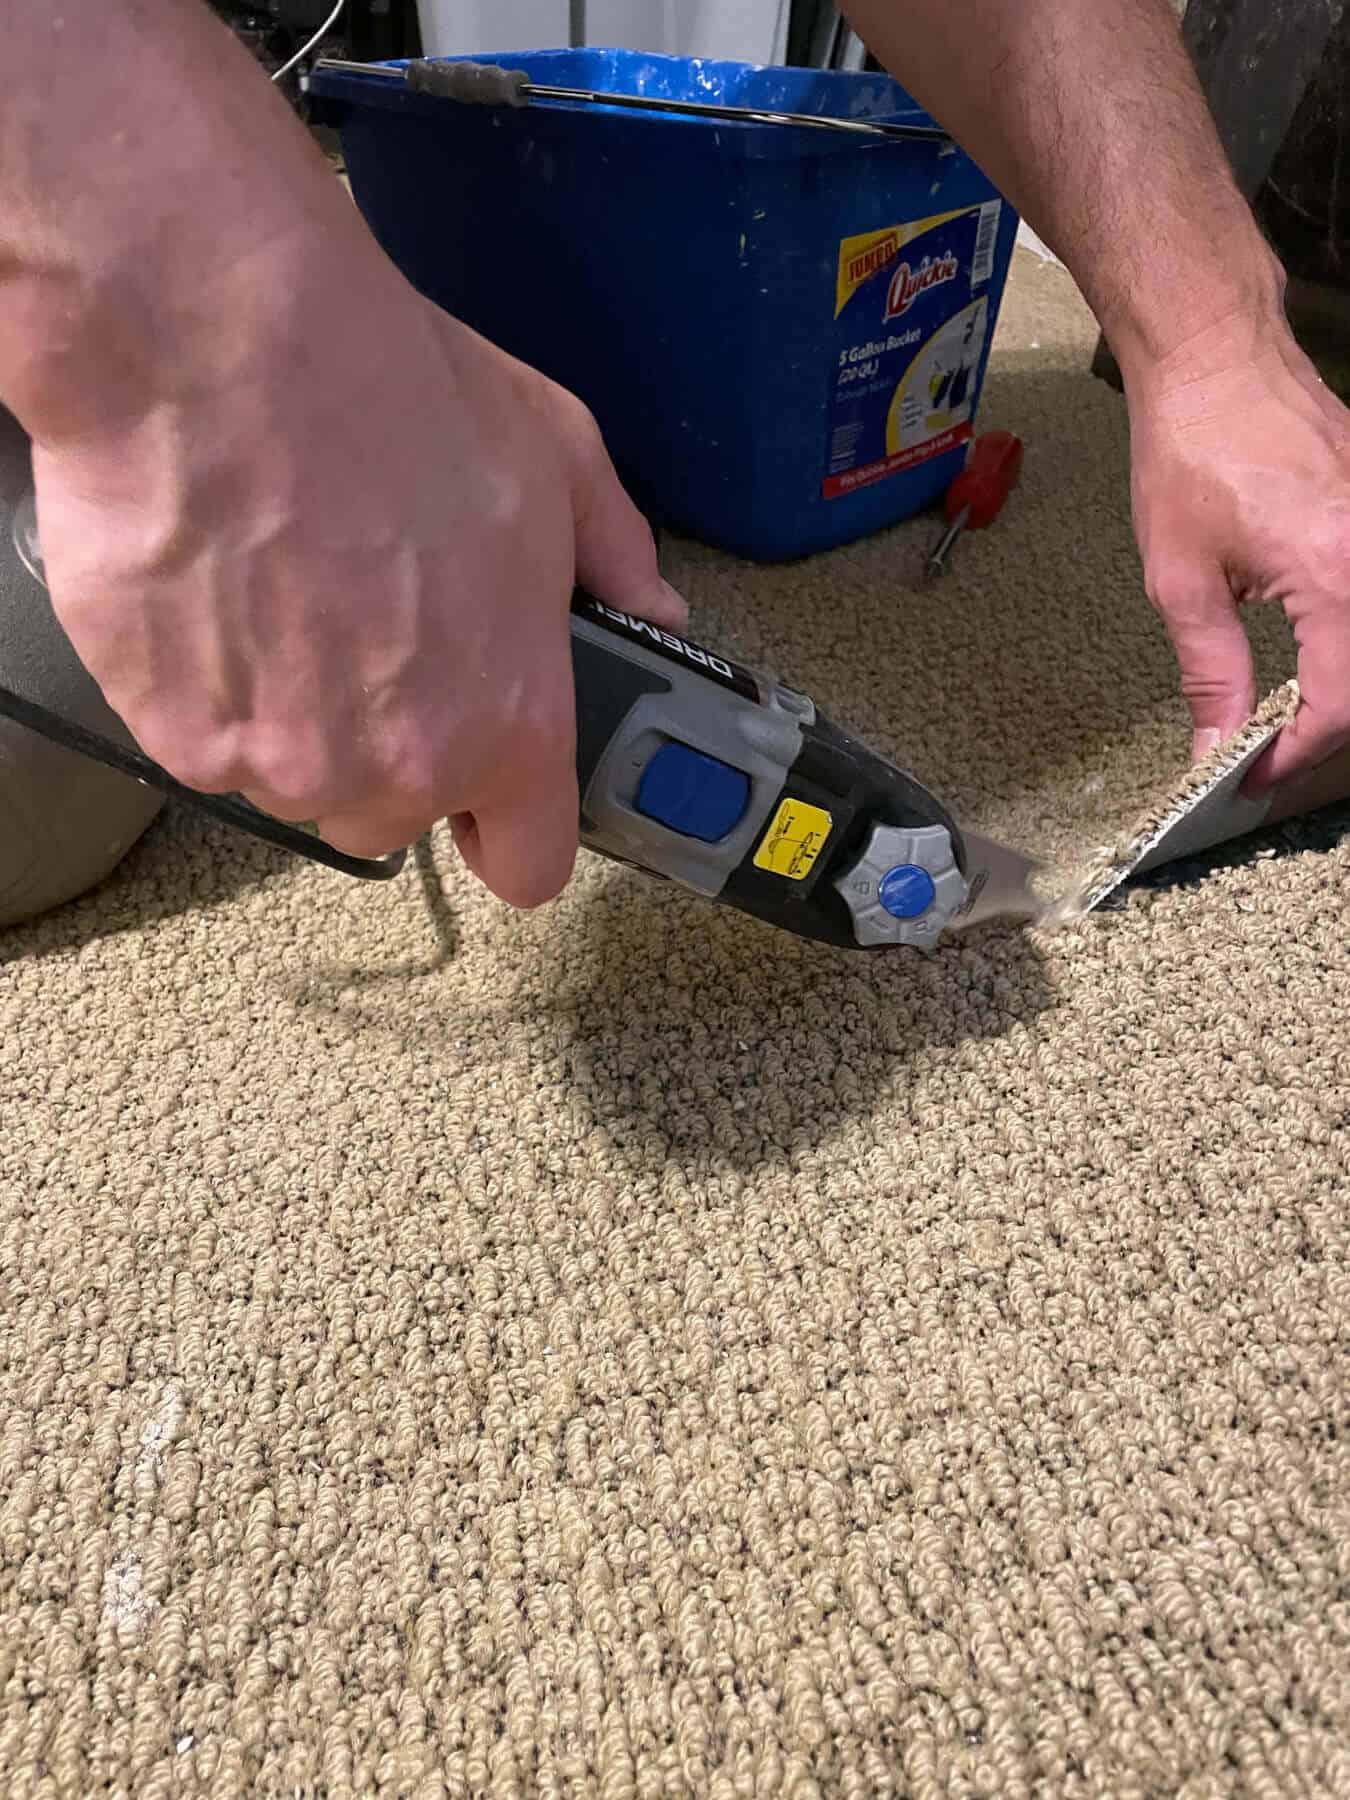 Dremel tool used to cut carpet